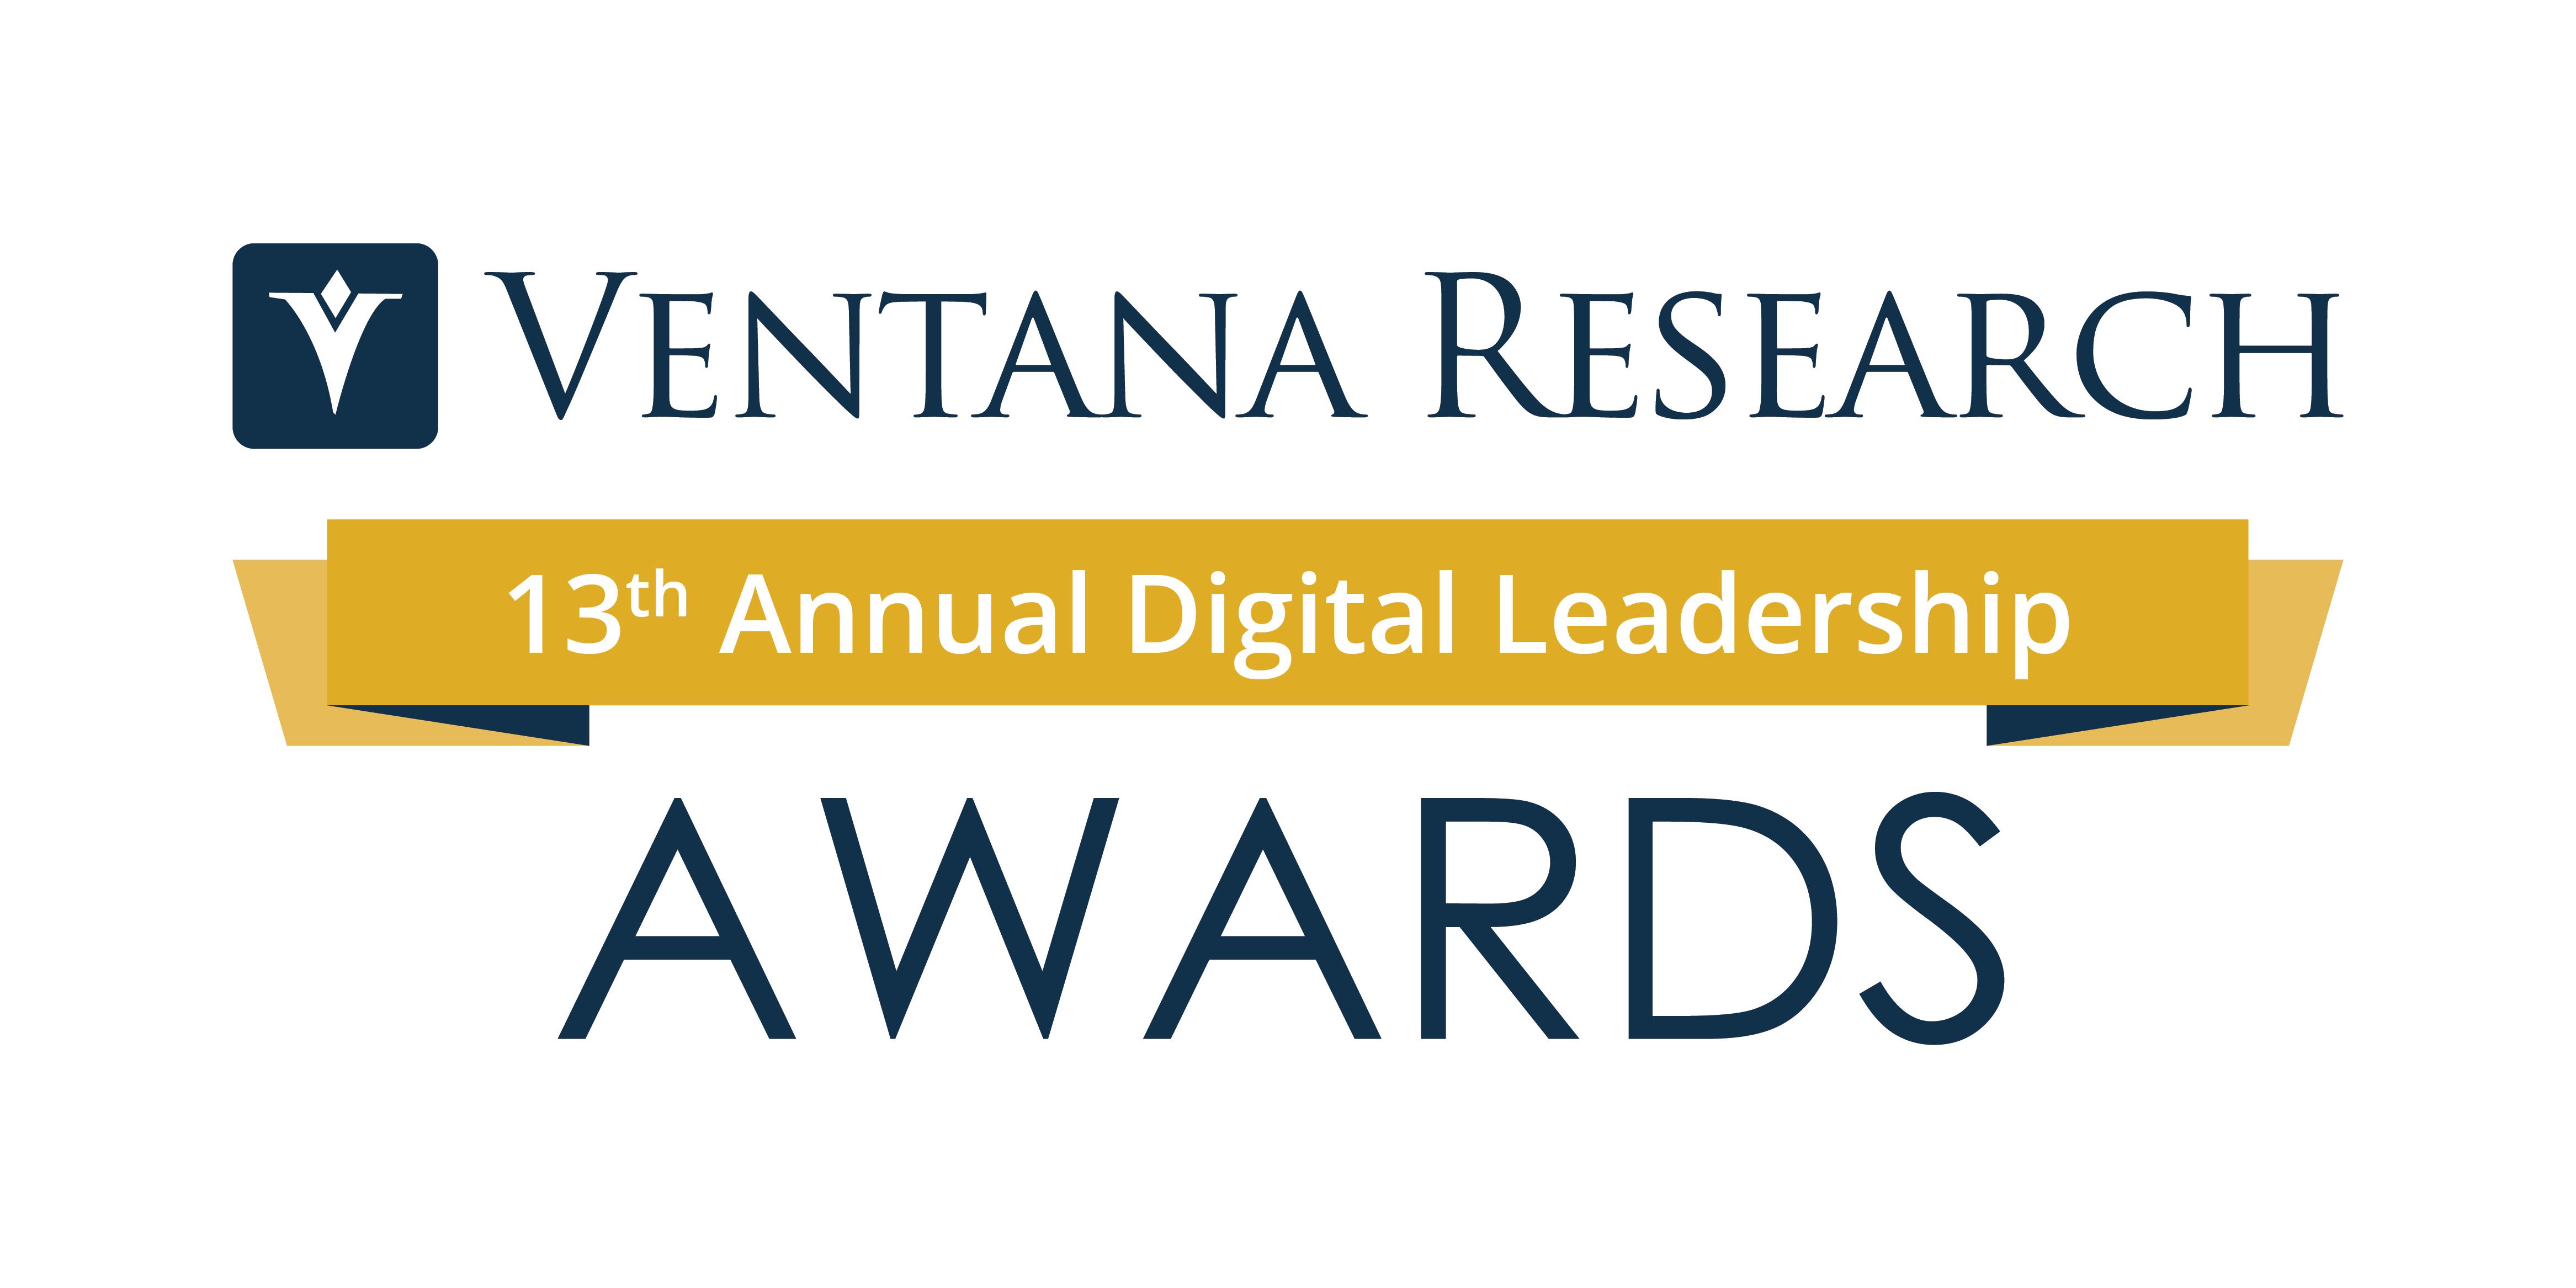 VentanaResearch_13th_Annual_Digital_LeadershipAwards_Main-3